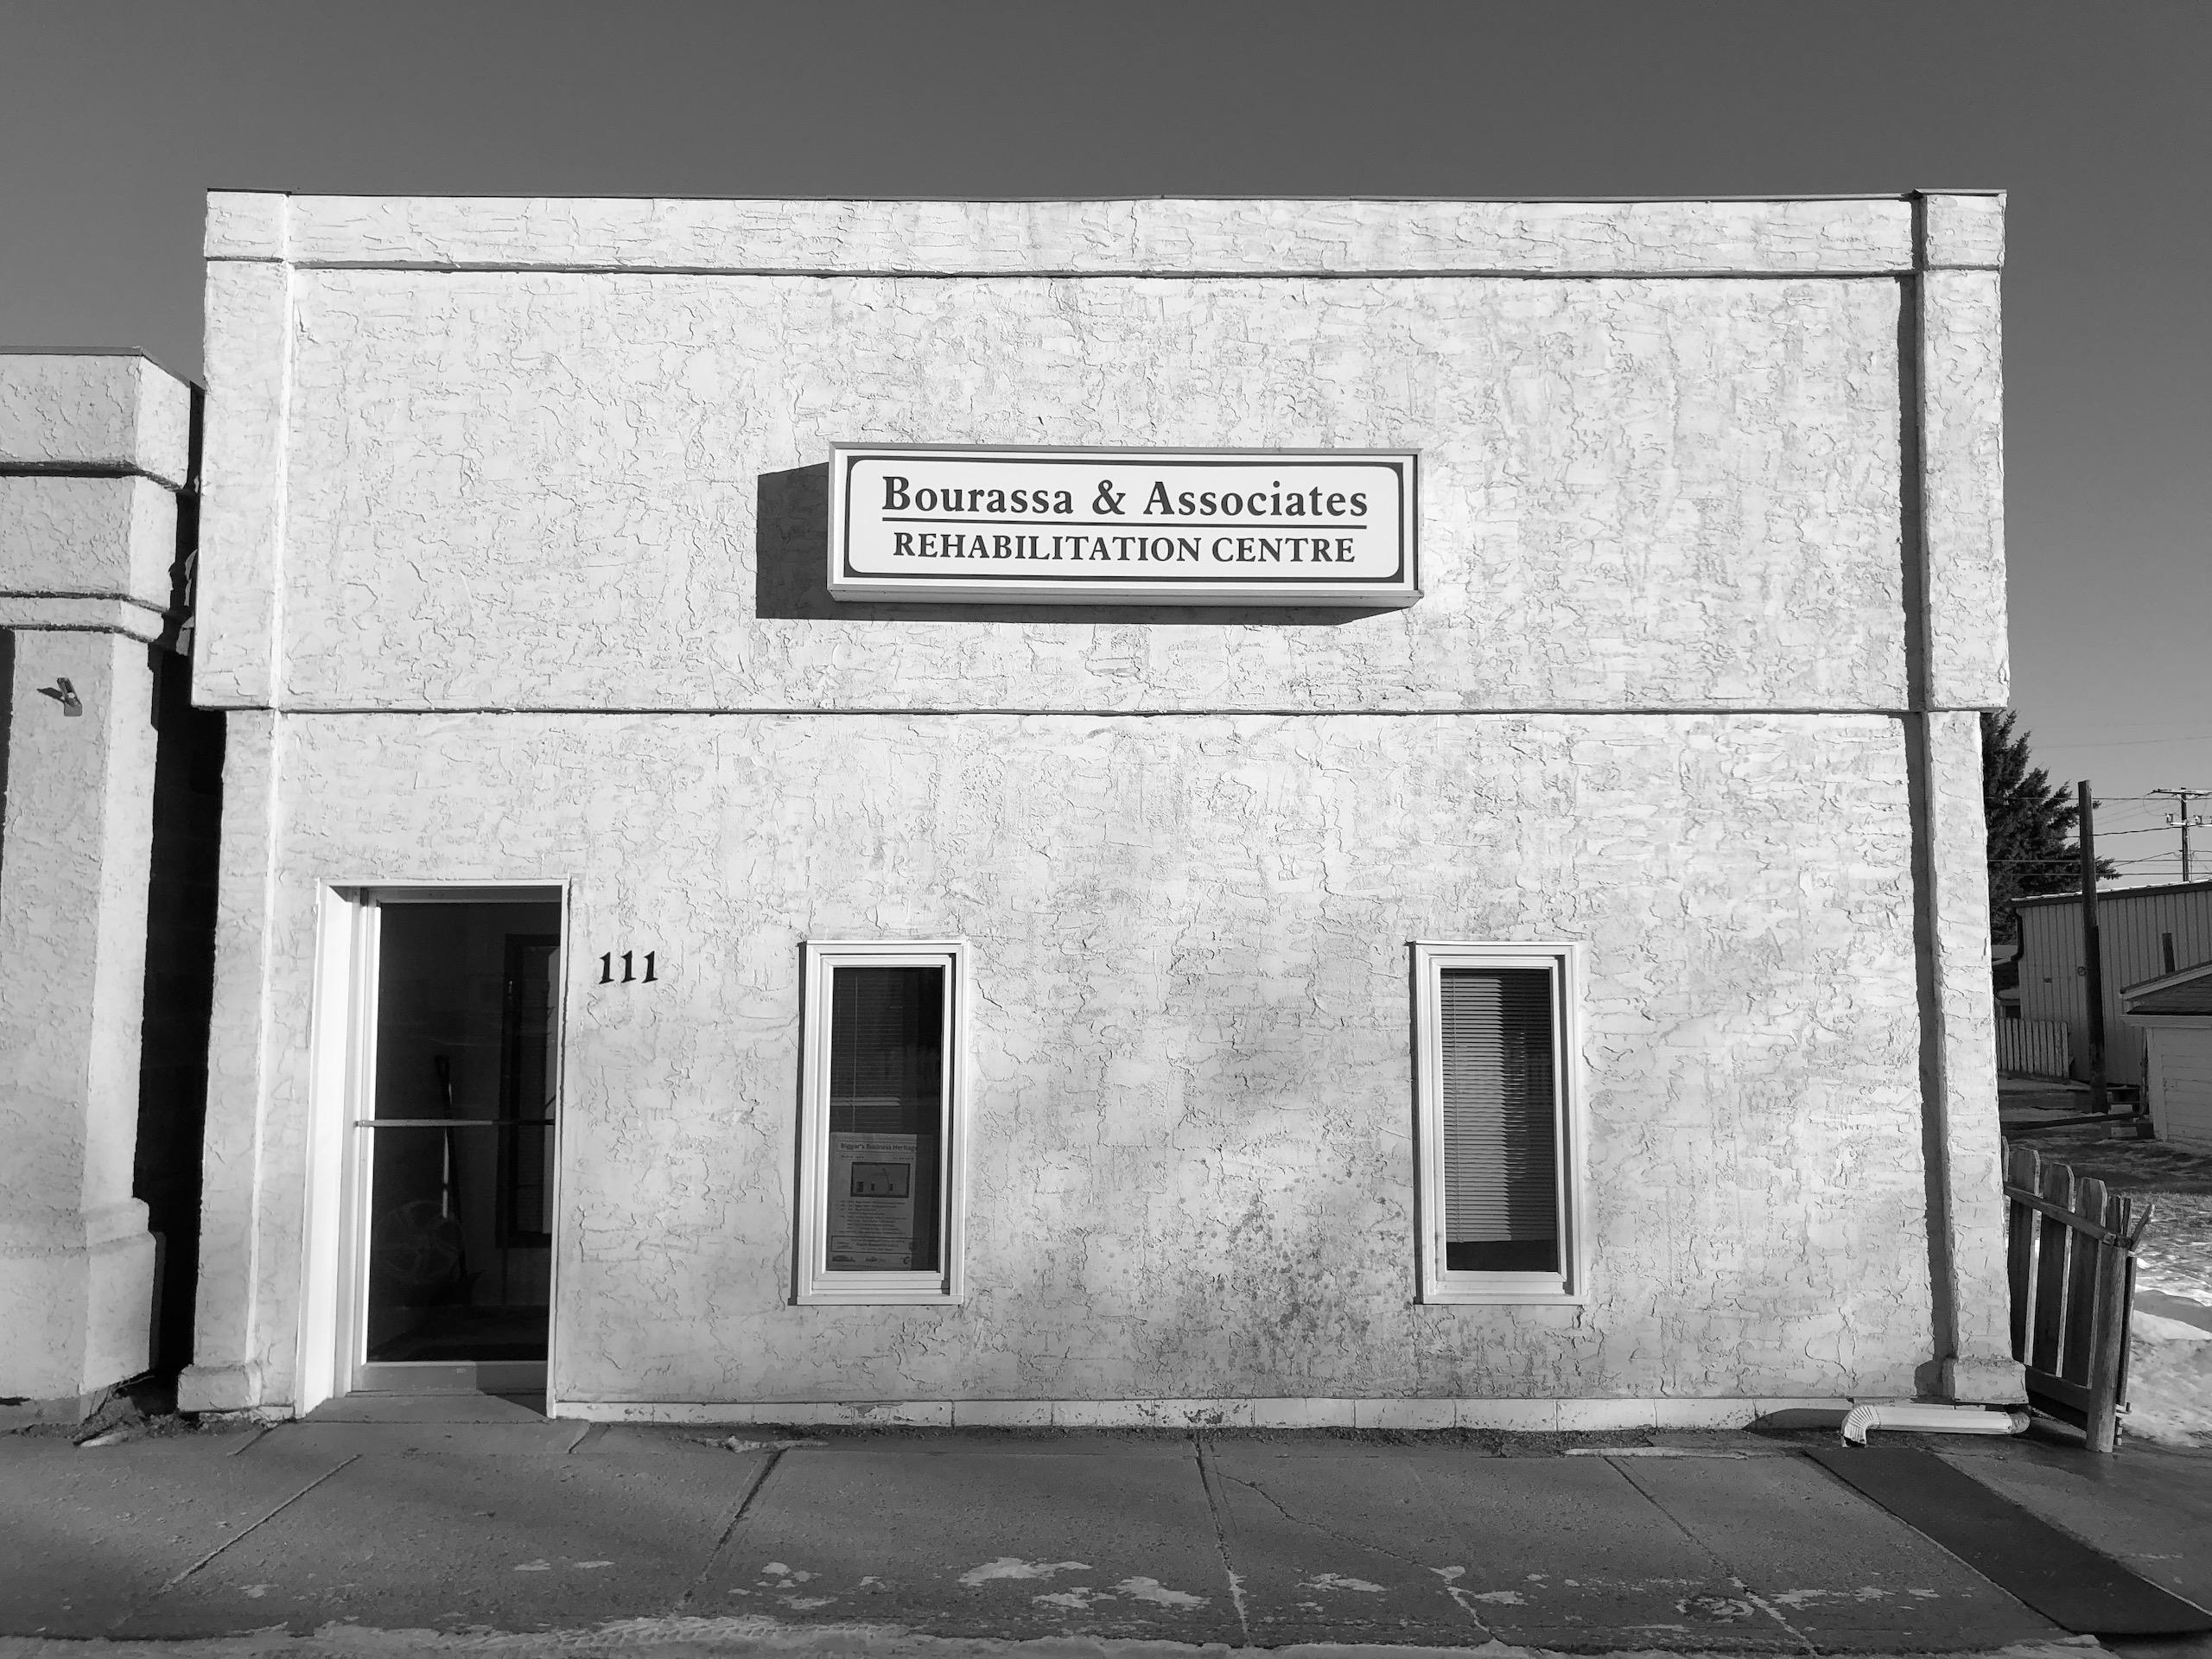 Biggar | Bourassa & Associates Rehabilitation Centre